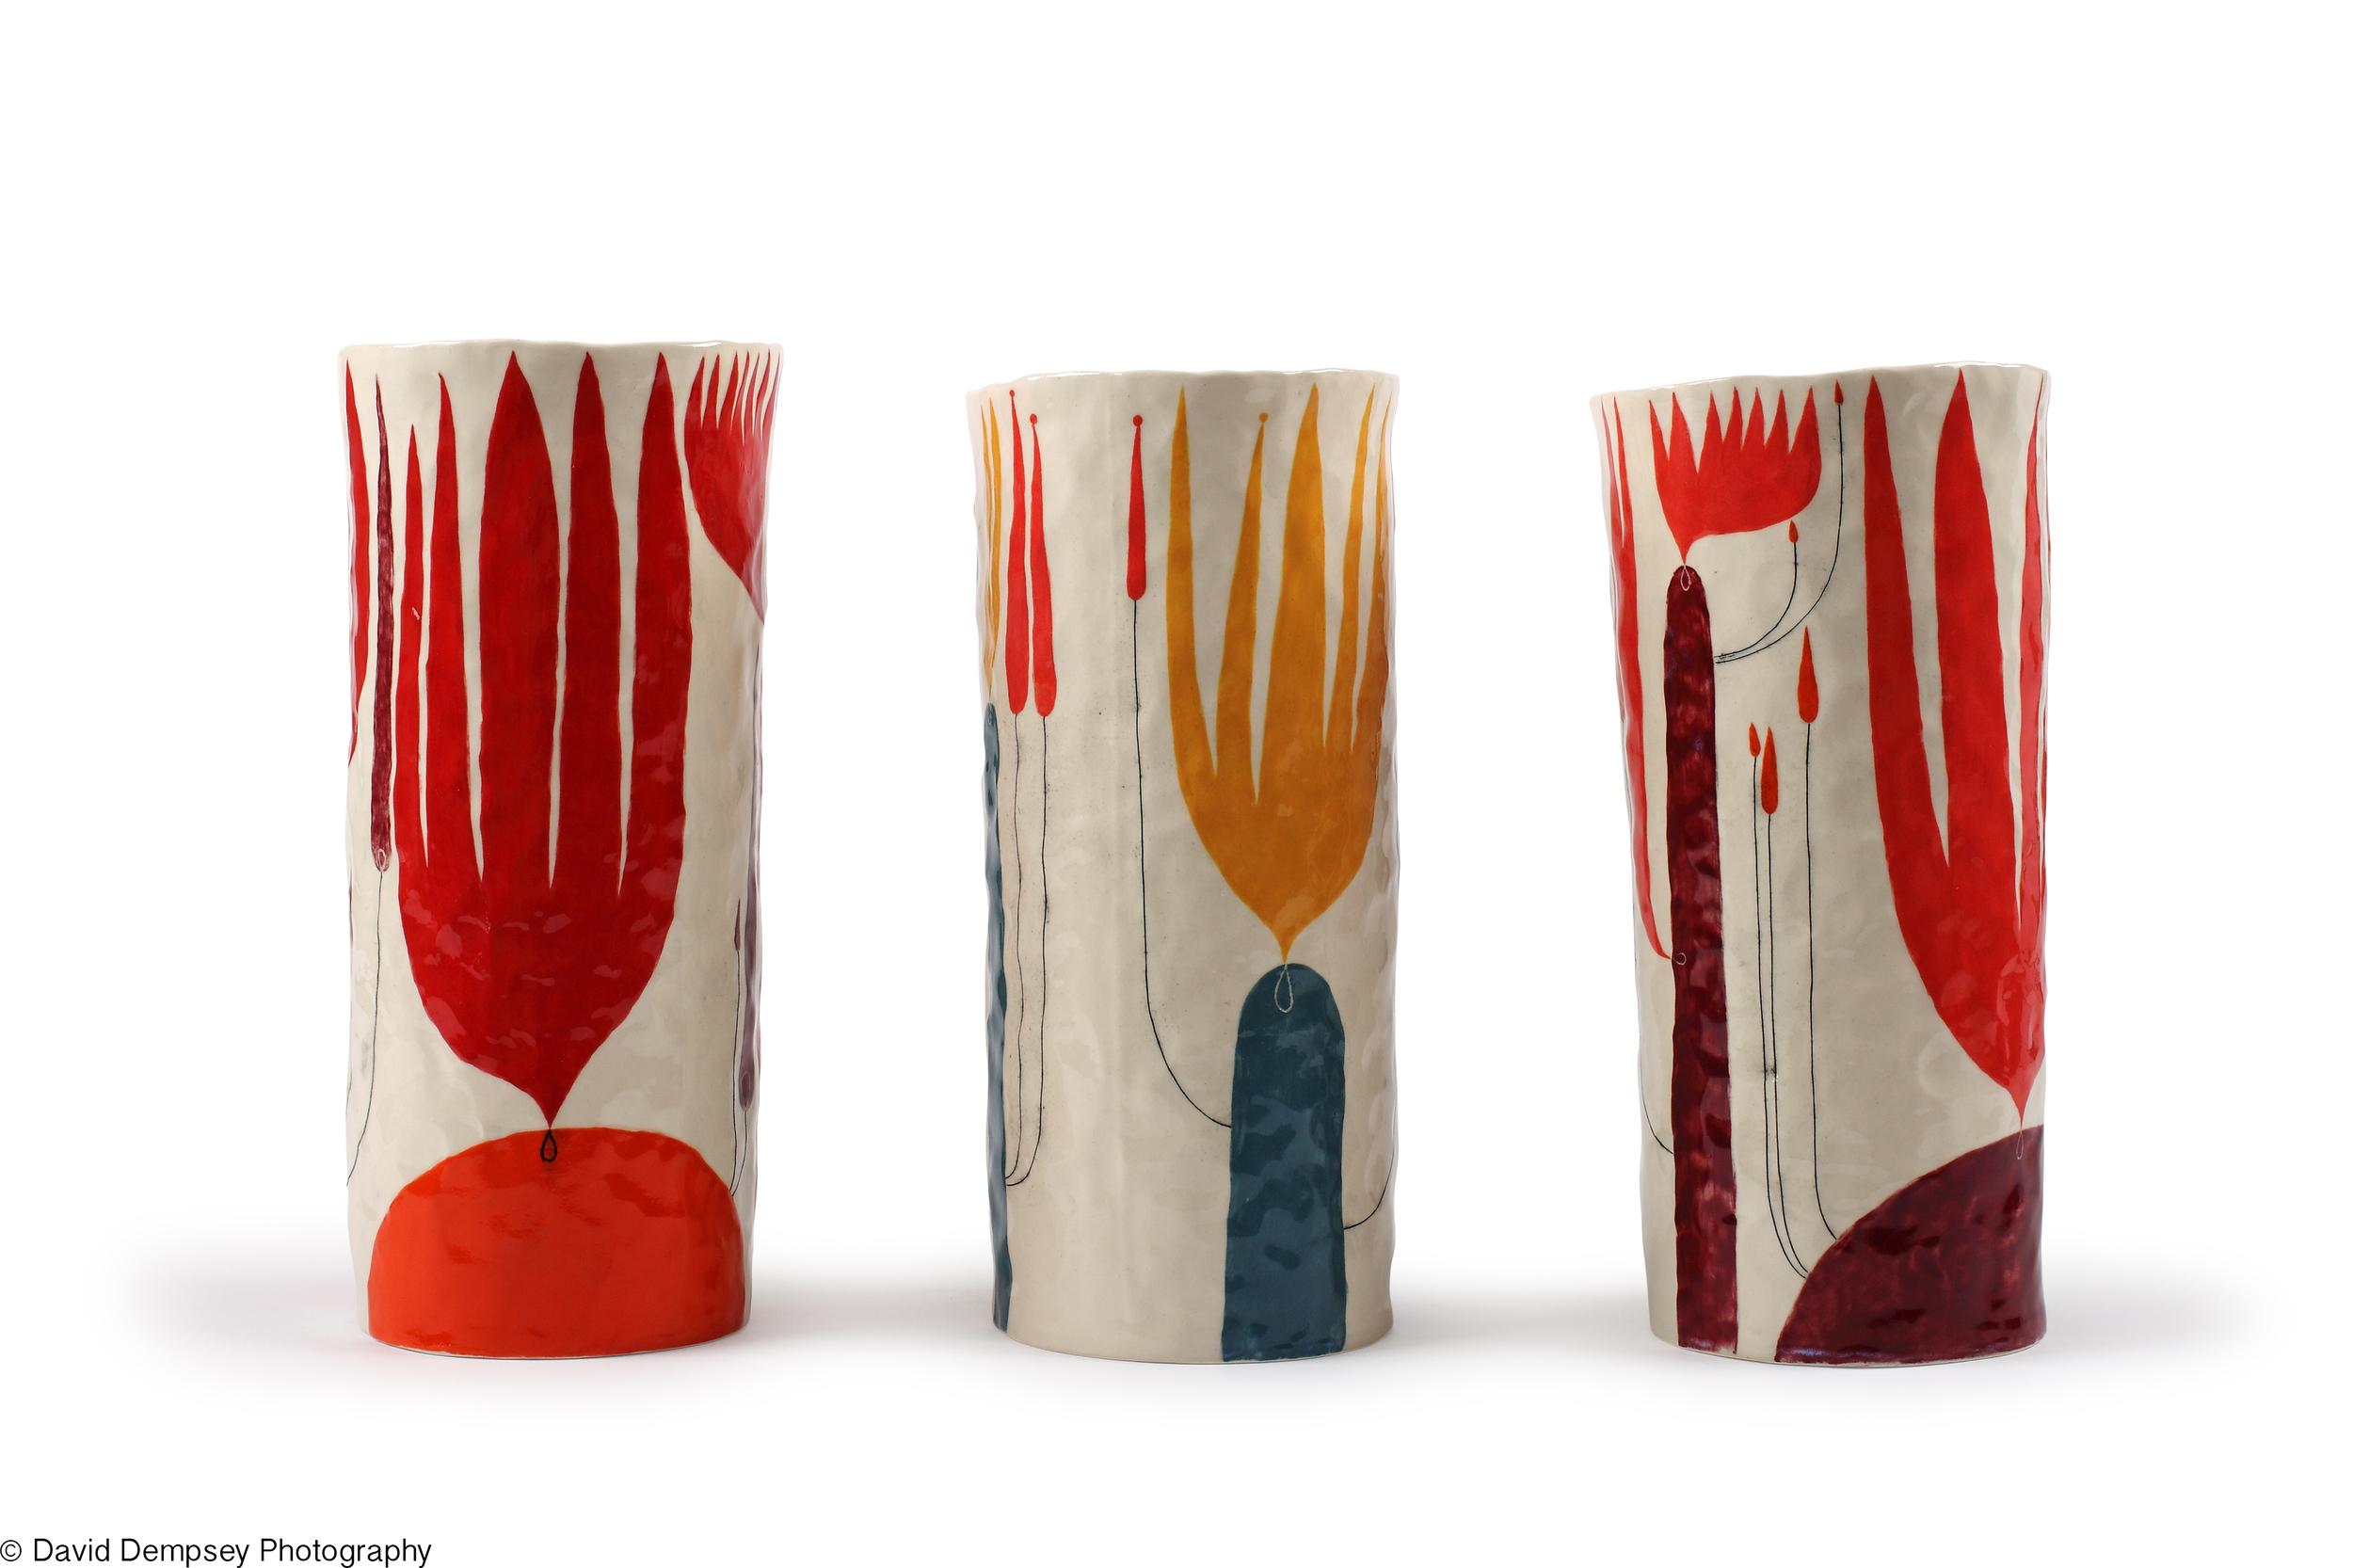 Straight vases - Andrew Ludick